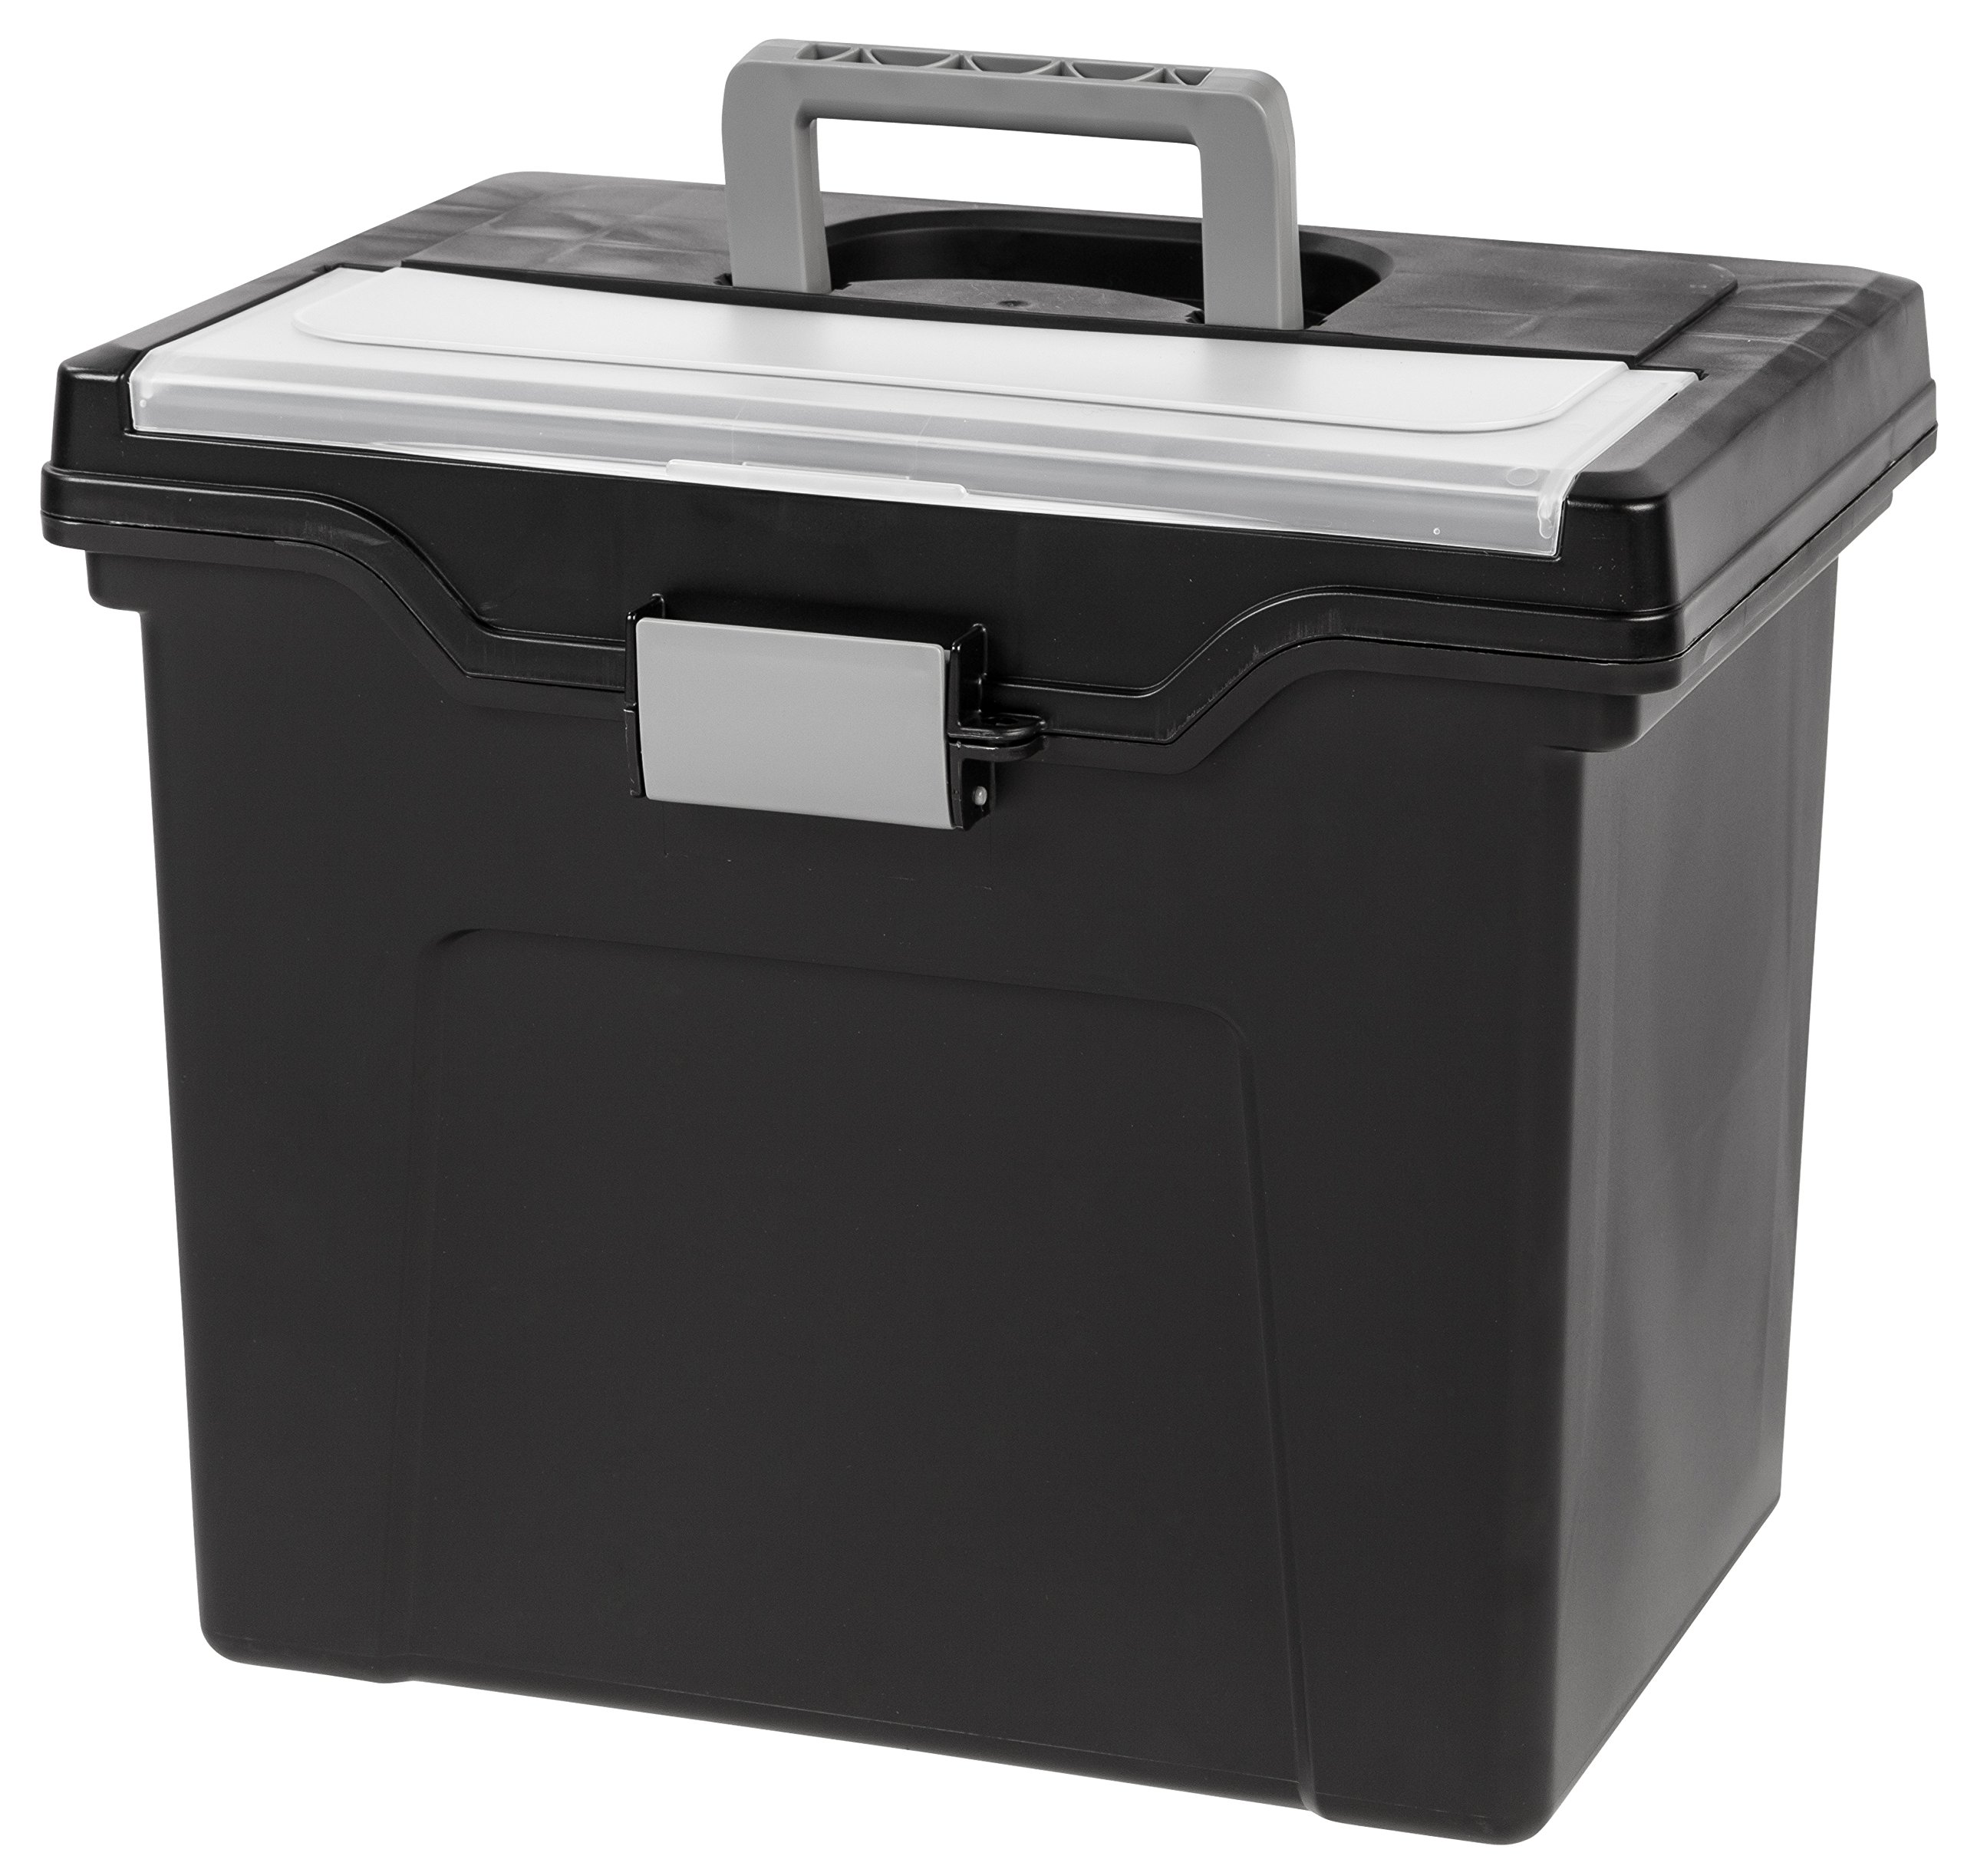 IRIS USA, Inc. HFB-24E-TOP Portable Letter Size File Box with Organizer Lid, 4 Pack, Black, Large, by IRIS USA, Inc.